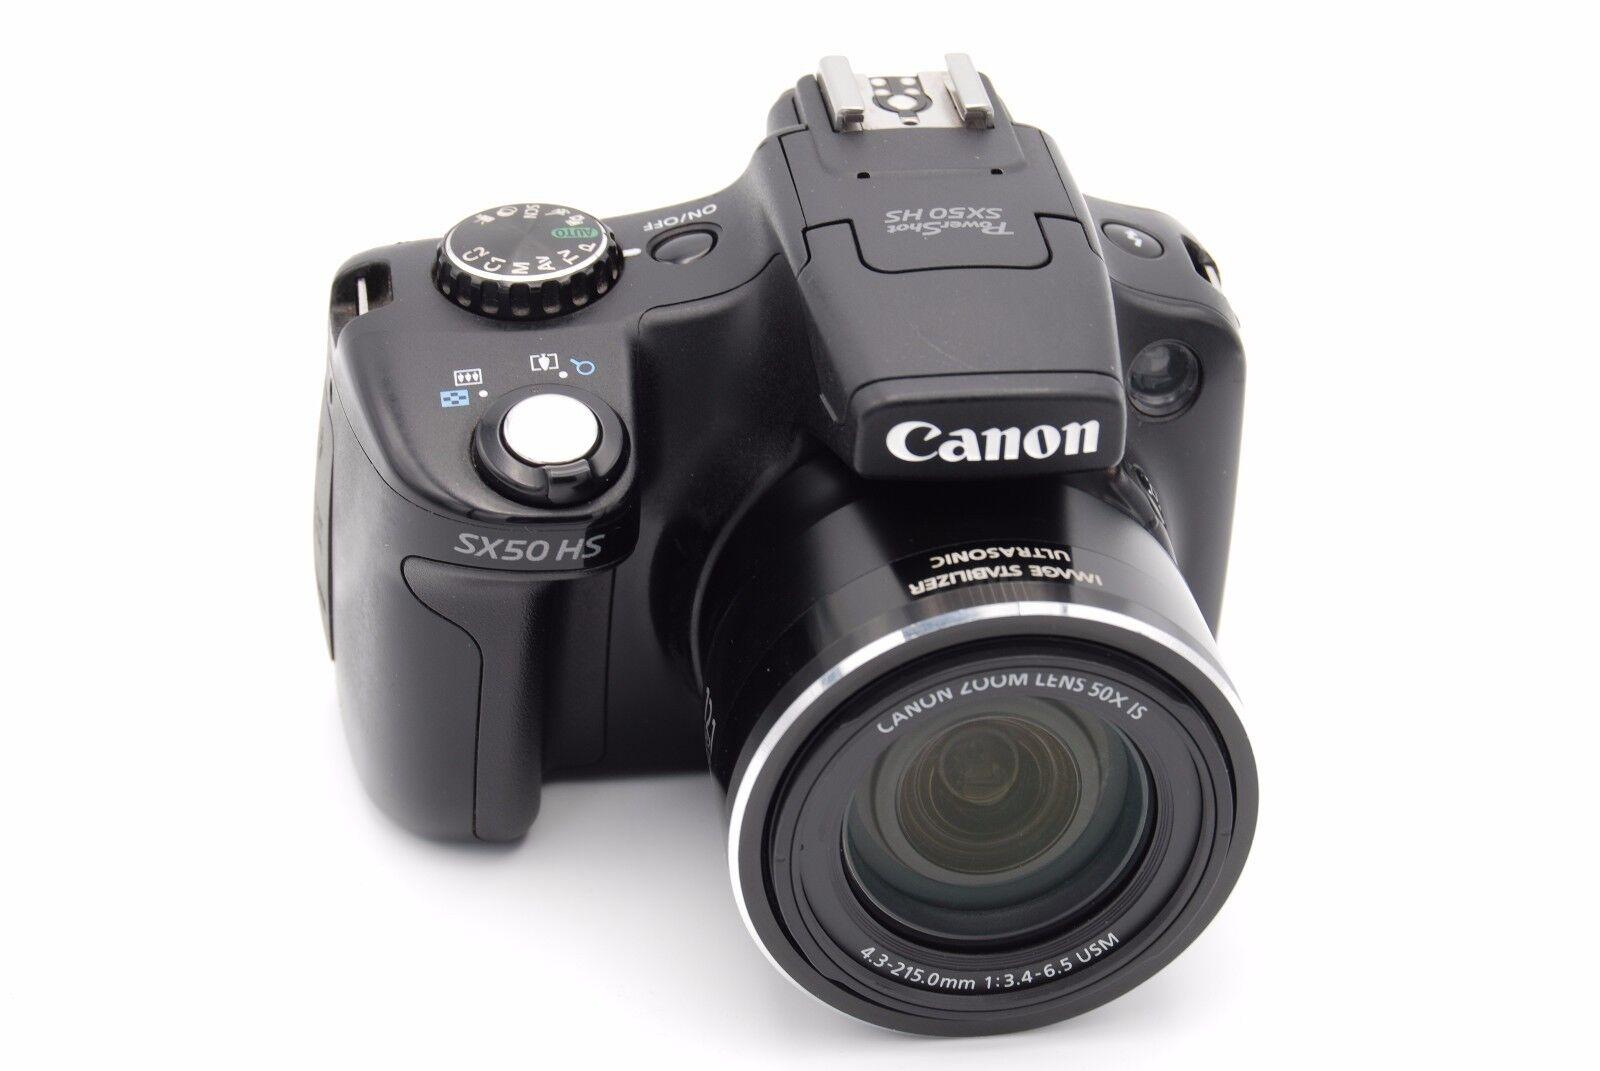 canon powershot sx50 hs 12 1 mp digital camera 50x optical zoom black 13803157192 ebay. Black Bedroom Furniture Sets. Home Design Ideas